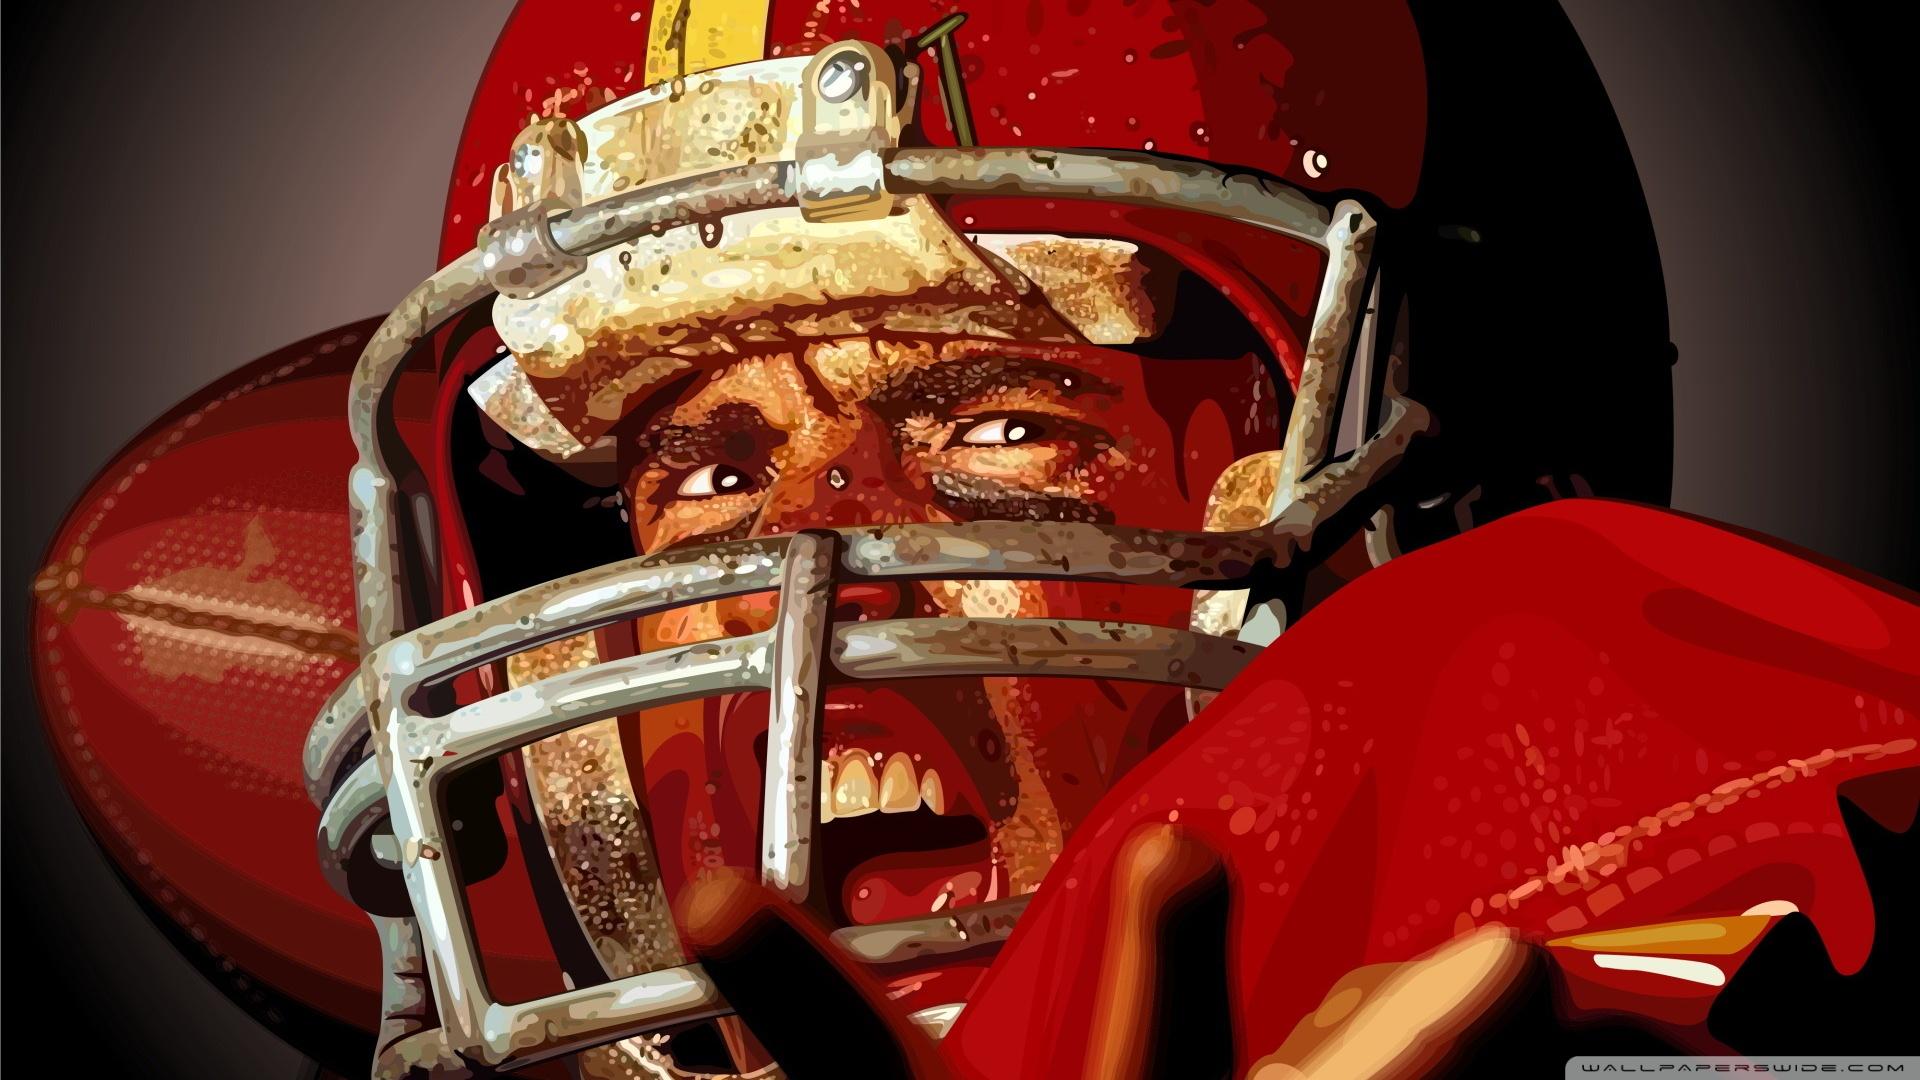 American Football 1080p: 1920x1080 HD Wallpaper American Football